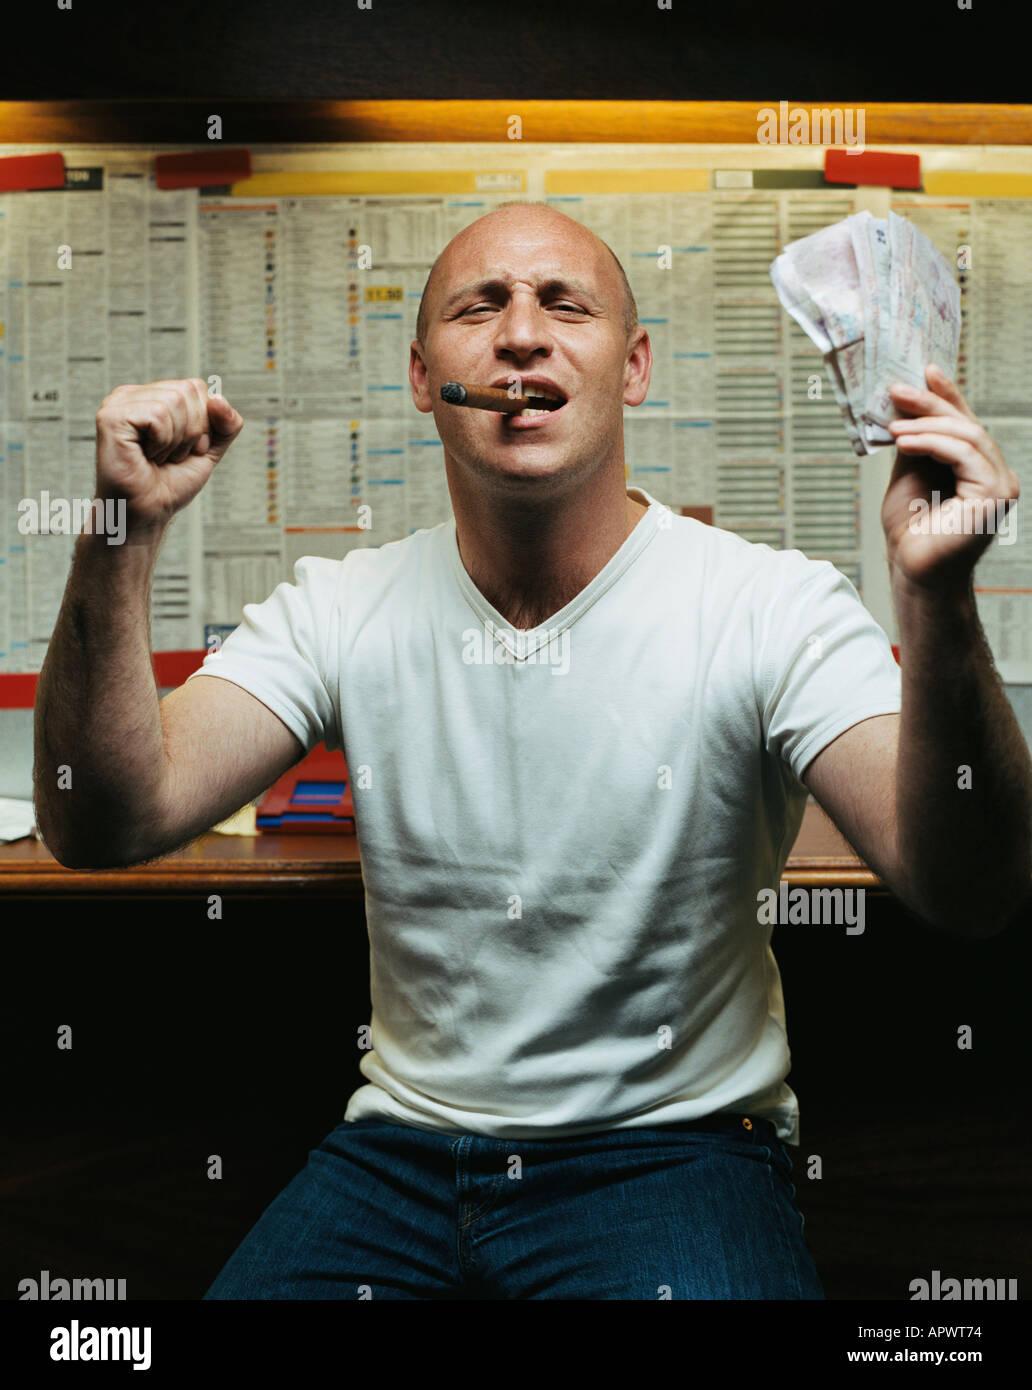 Man celebrating win at betting shop - Stock Image